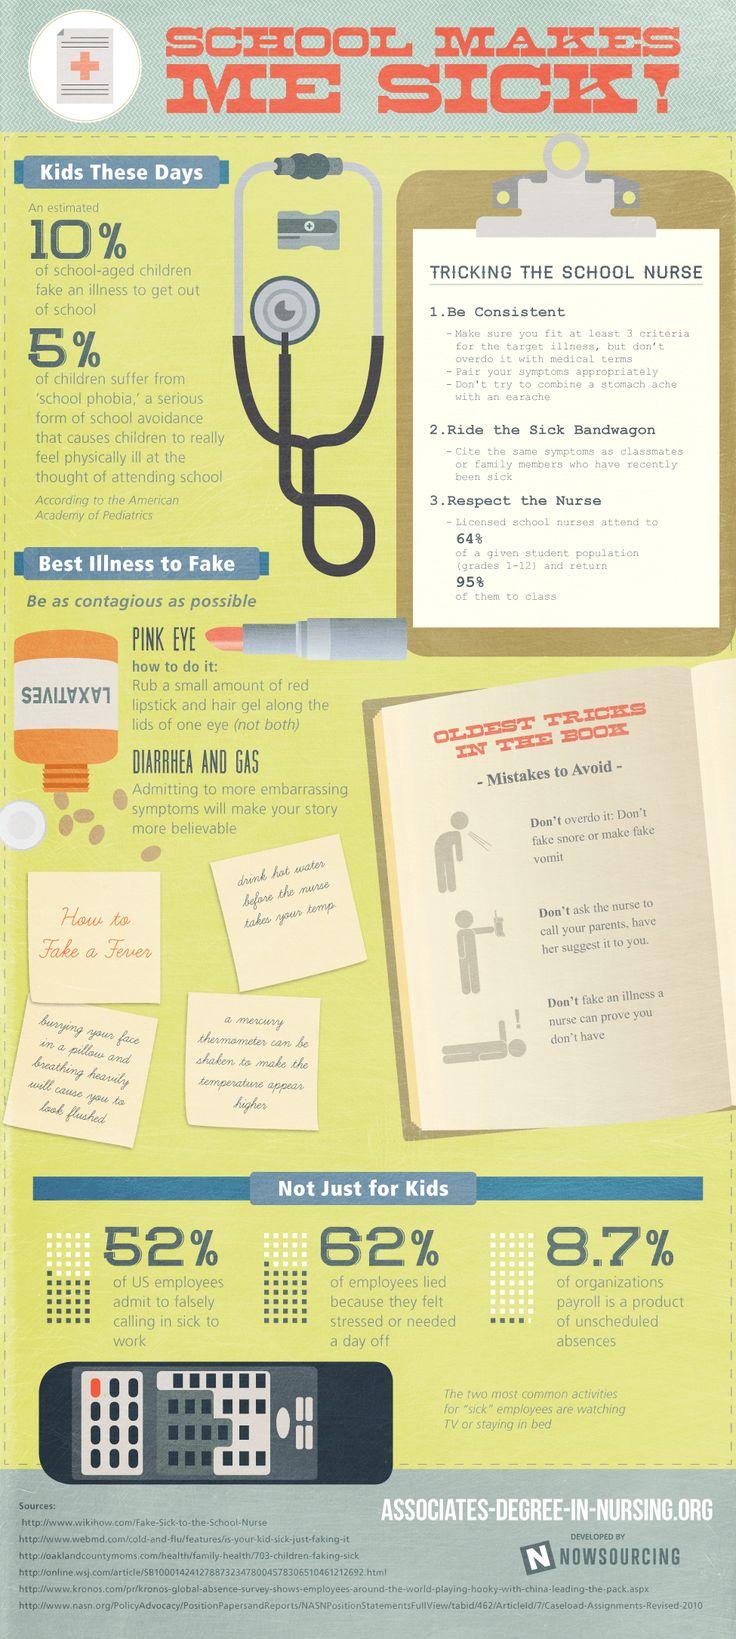 nursing infographic | In this infographic, associates-degree-in-nursing.org identifies the ...